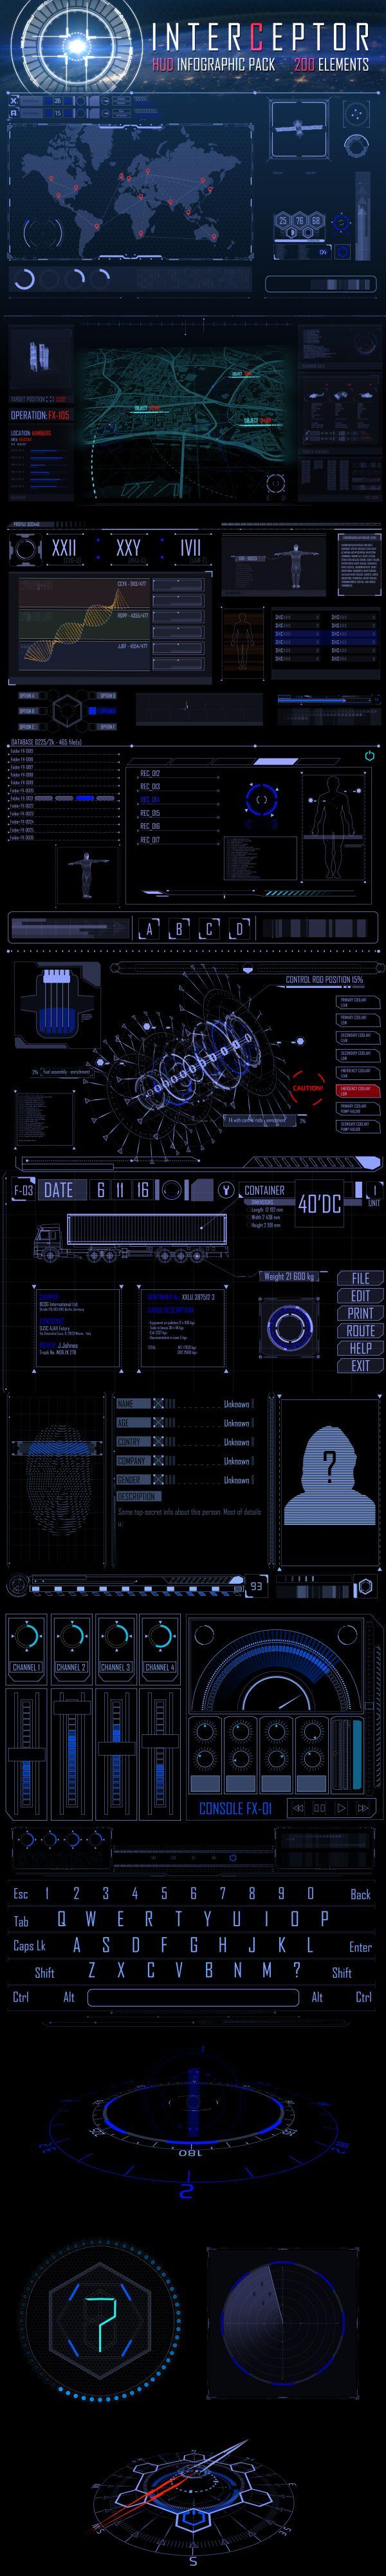 Interceptor Infographic HUD Pack